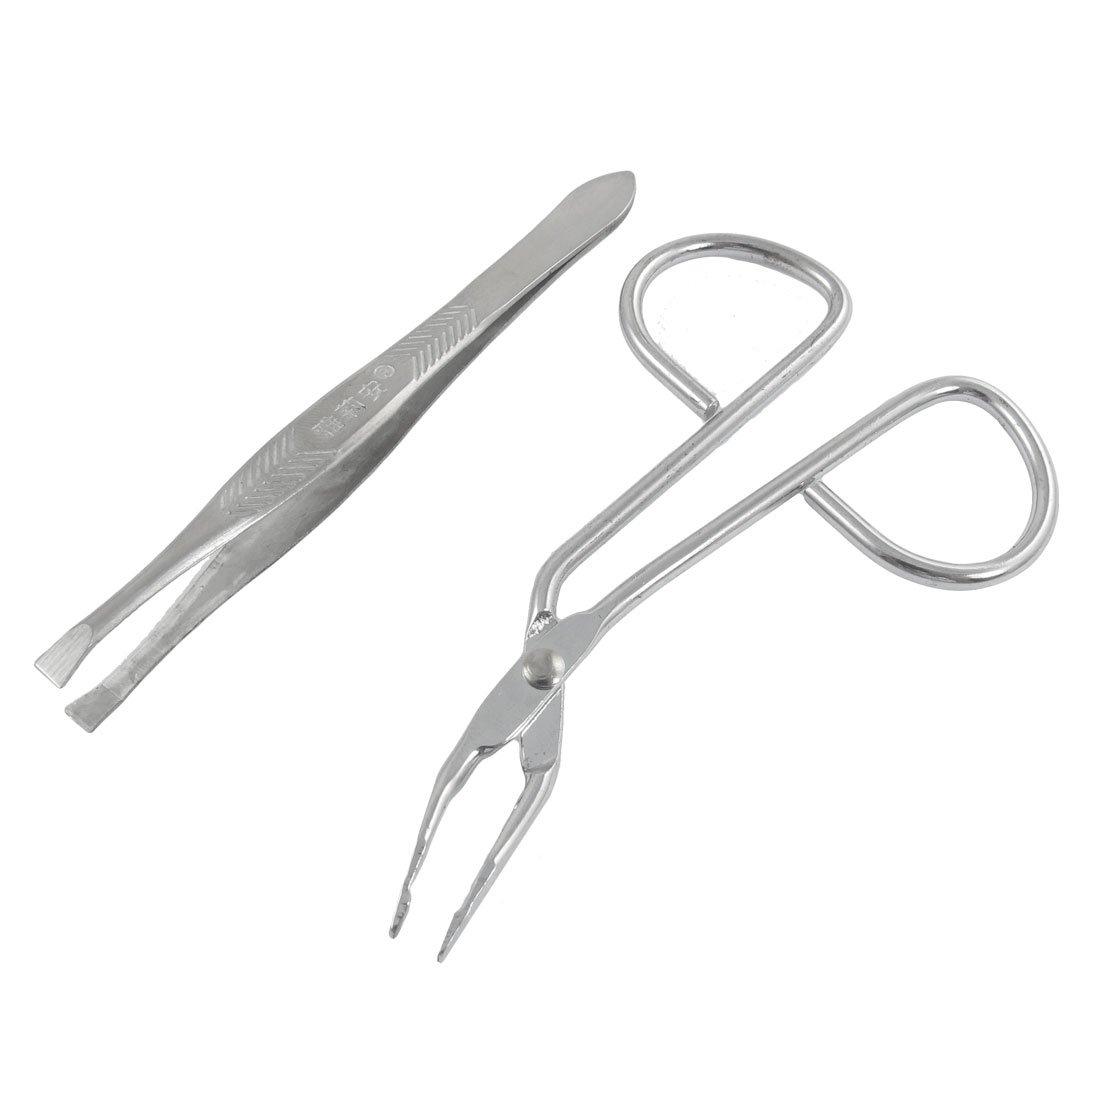 uxcell Silver Tone Flat Tip Tweezers Eyebrow Scissors Beauty Tool Set a12071300ux0602